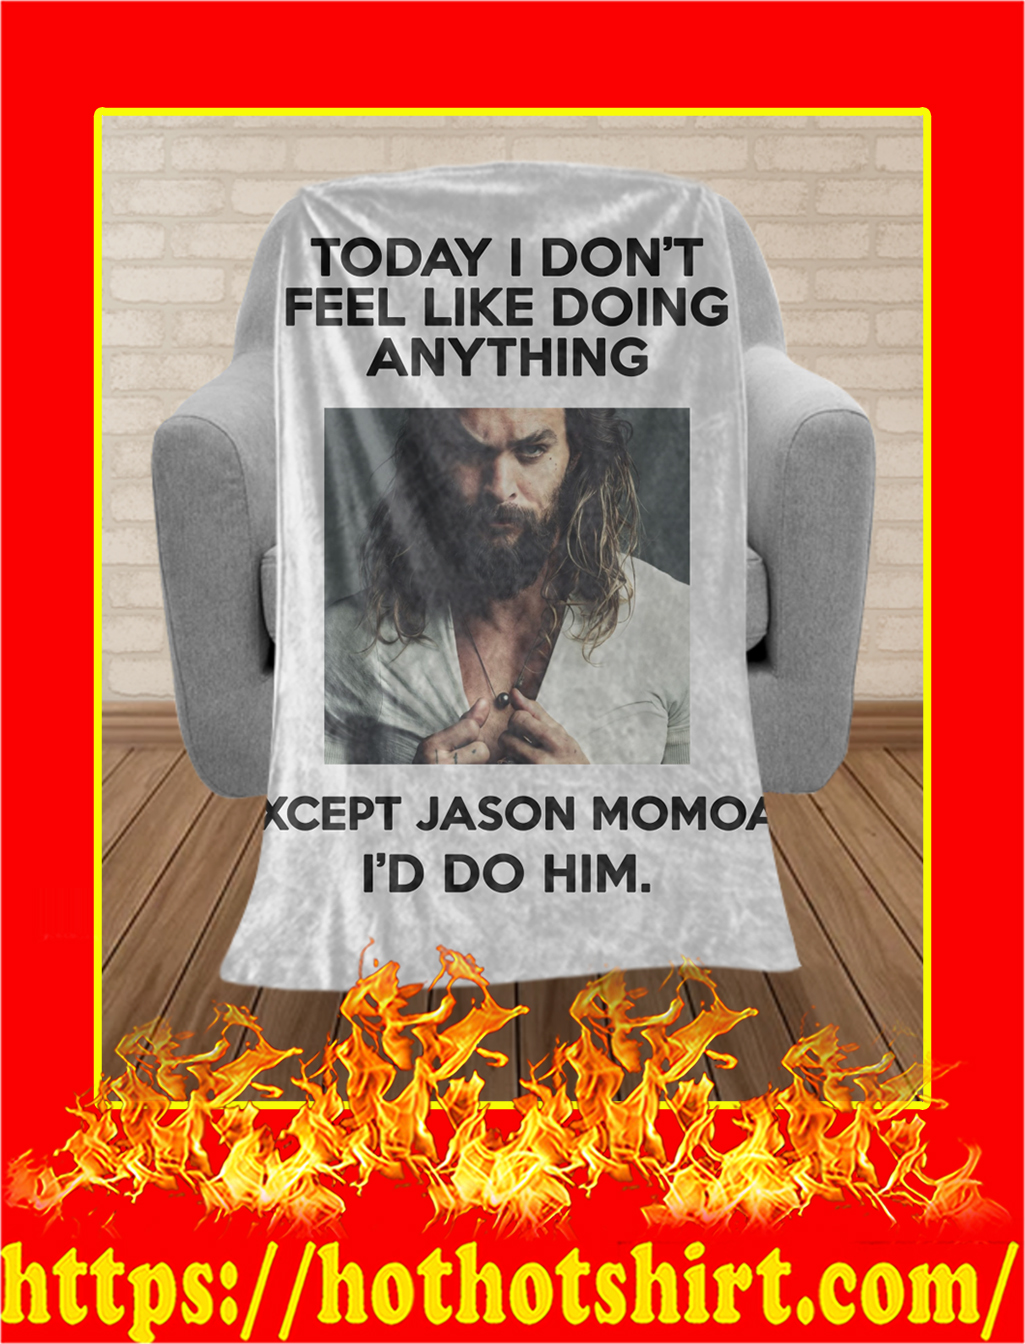 Jason Momoa Today I Don't Feel Like Doing Anything Blanket- 50x60